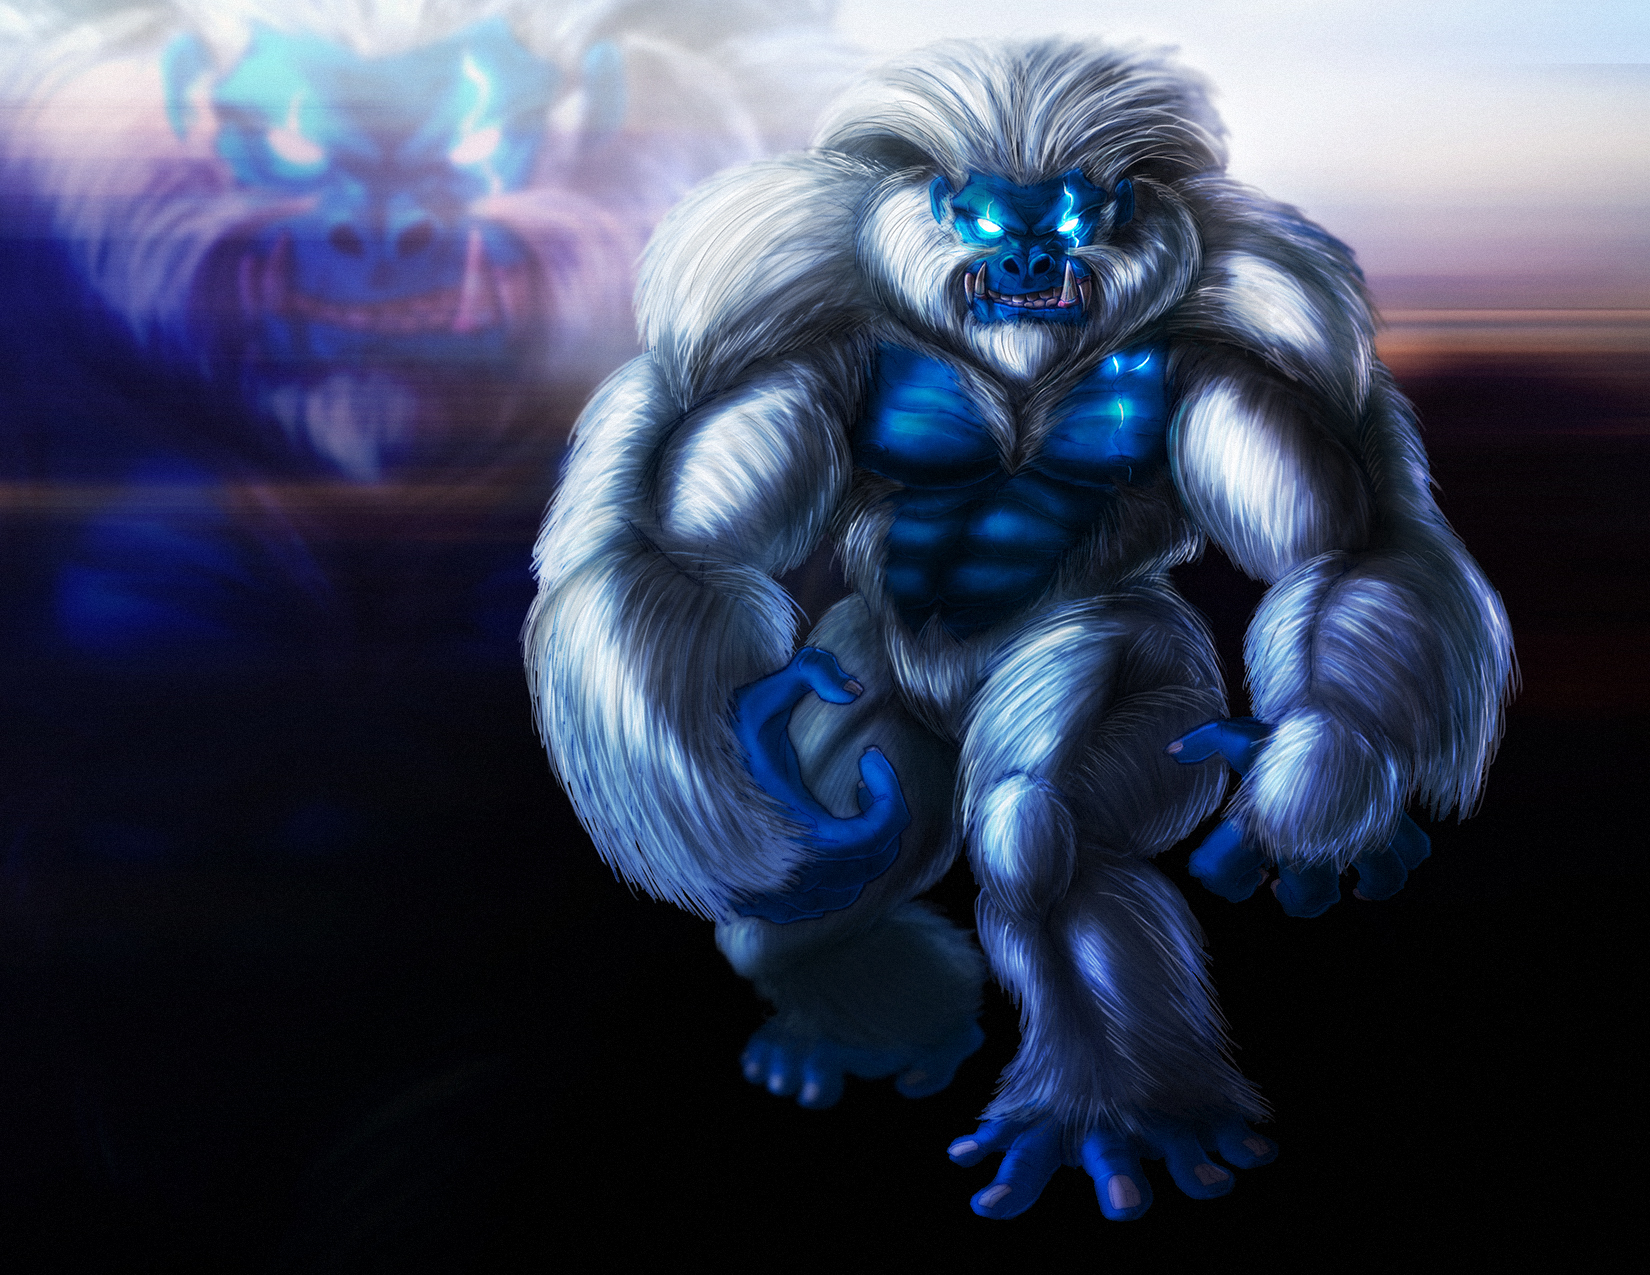 Primal Rage: Blizzard by PioPauloSantana